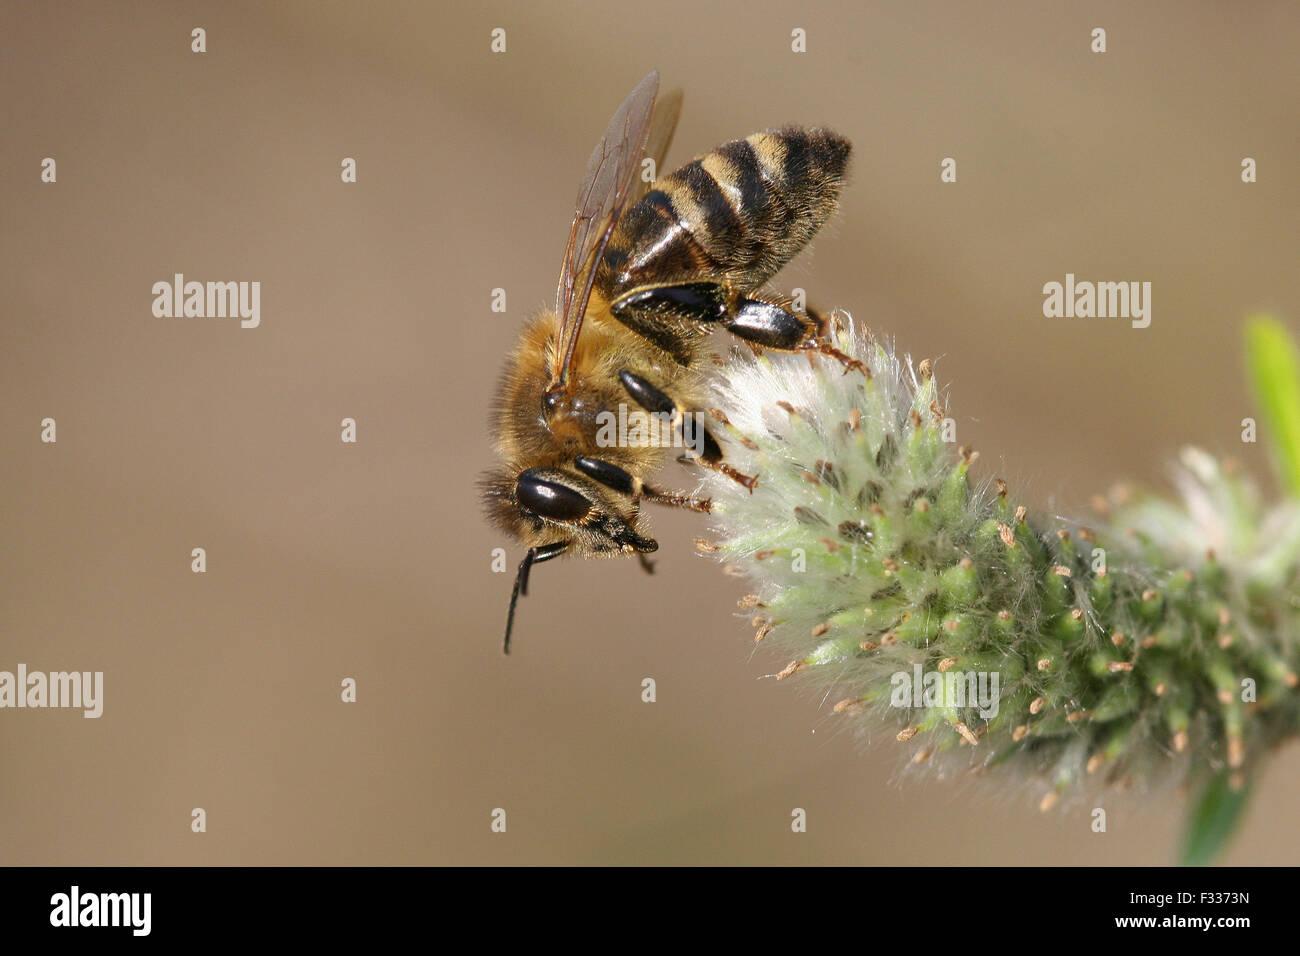 Western honey bee or European honey bee (Apis mellifera) on a goat willow flower (Salix caprea), Thuringia, Germany - Stock Image